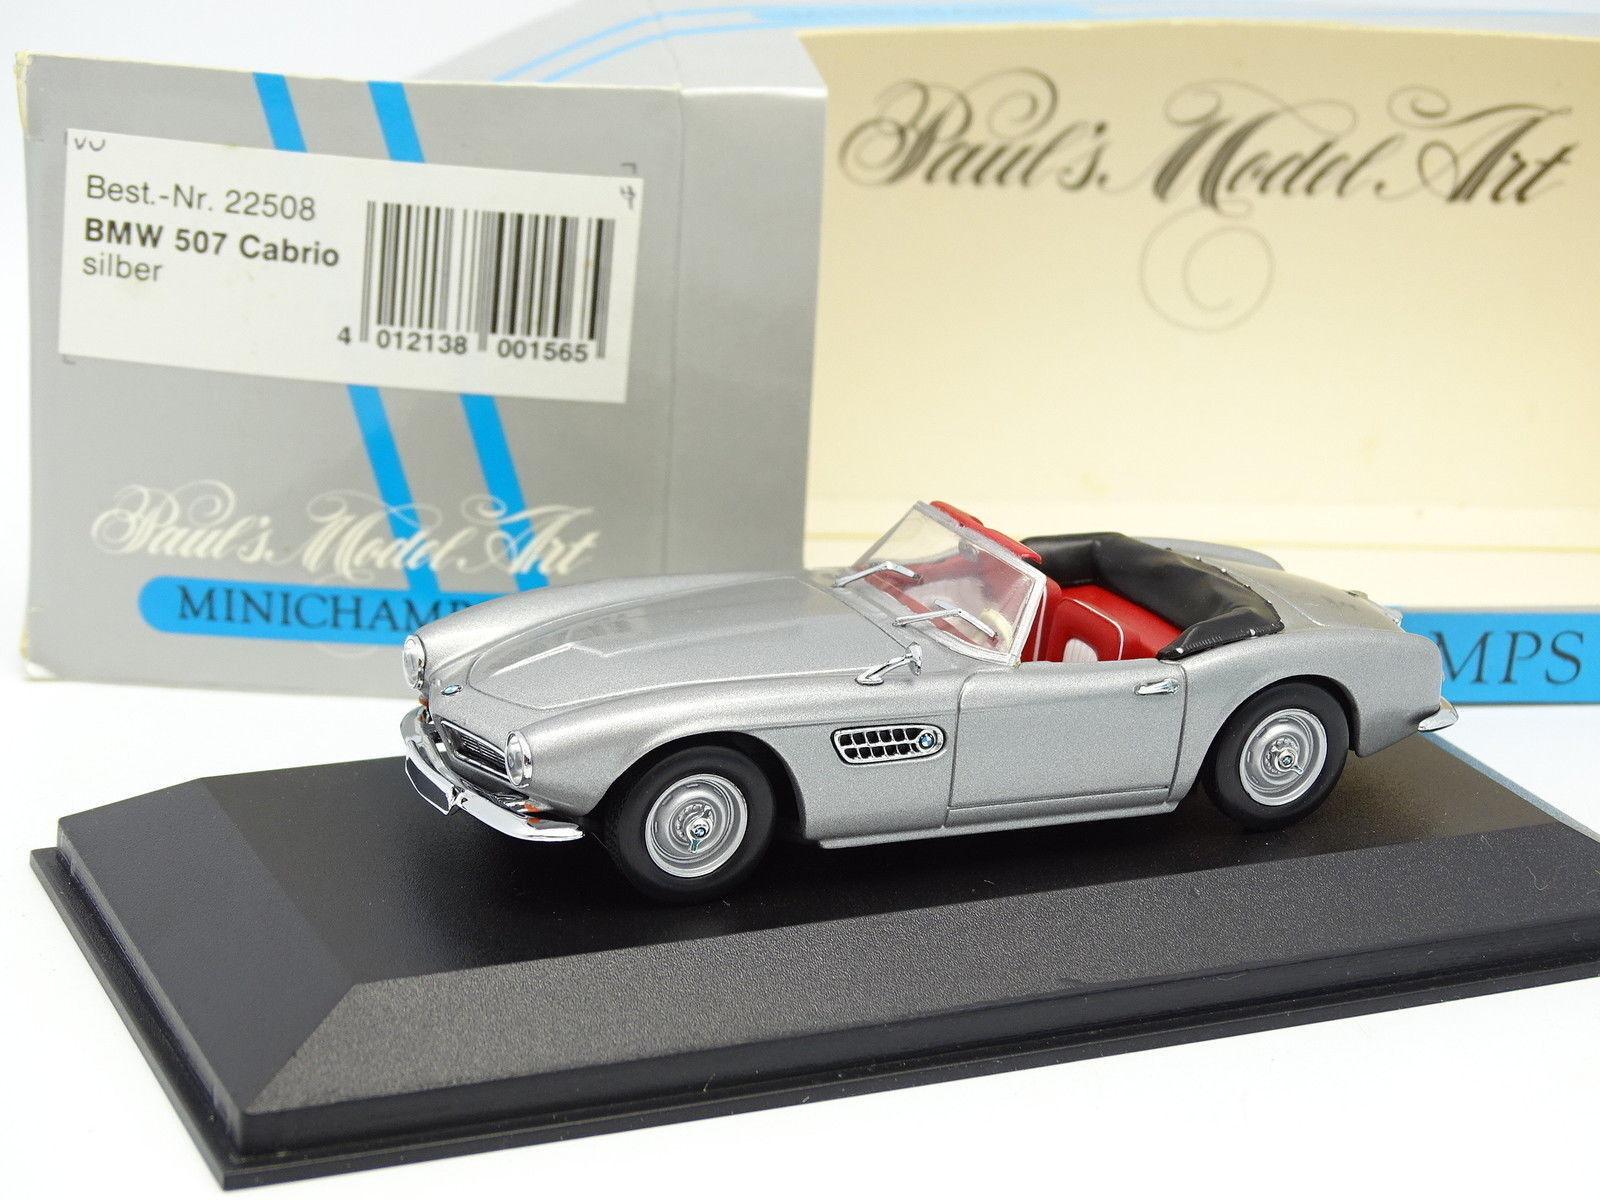 Minichamps 1 43 - BMW 507 Cabrio argento